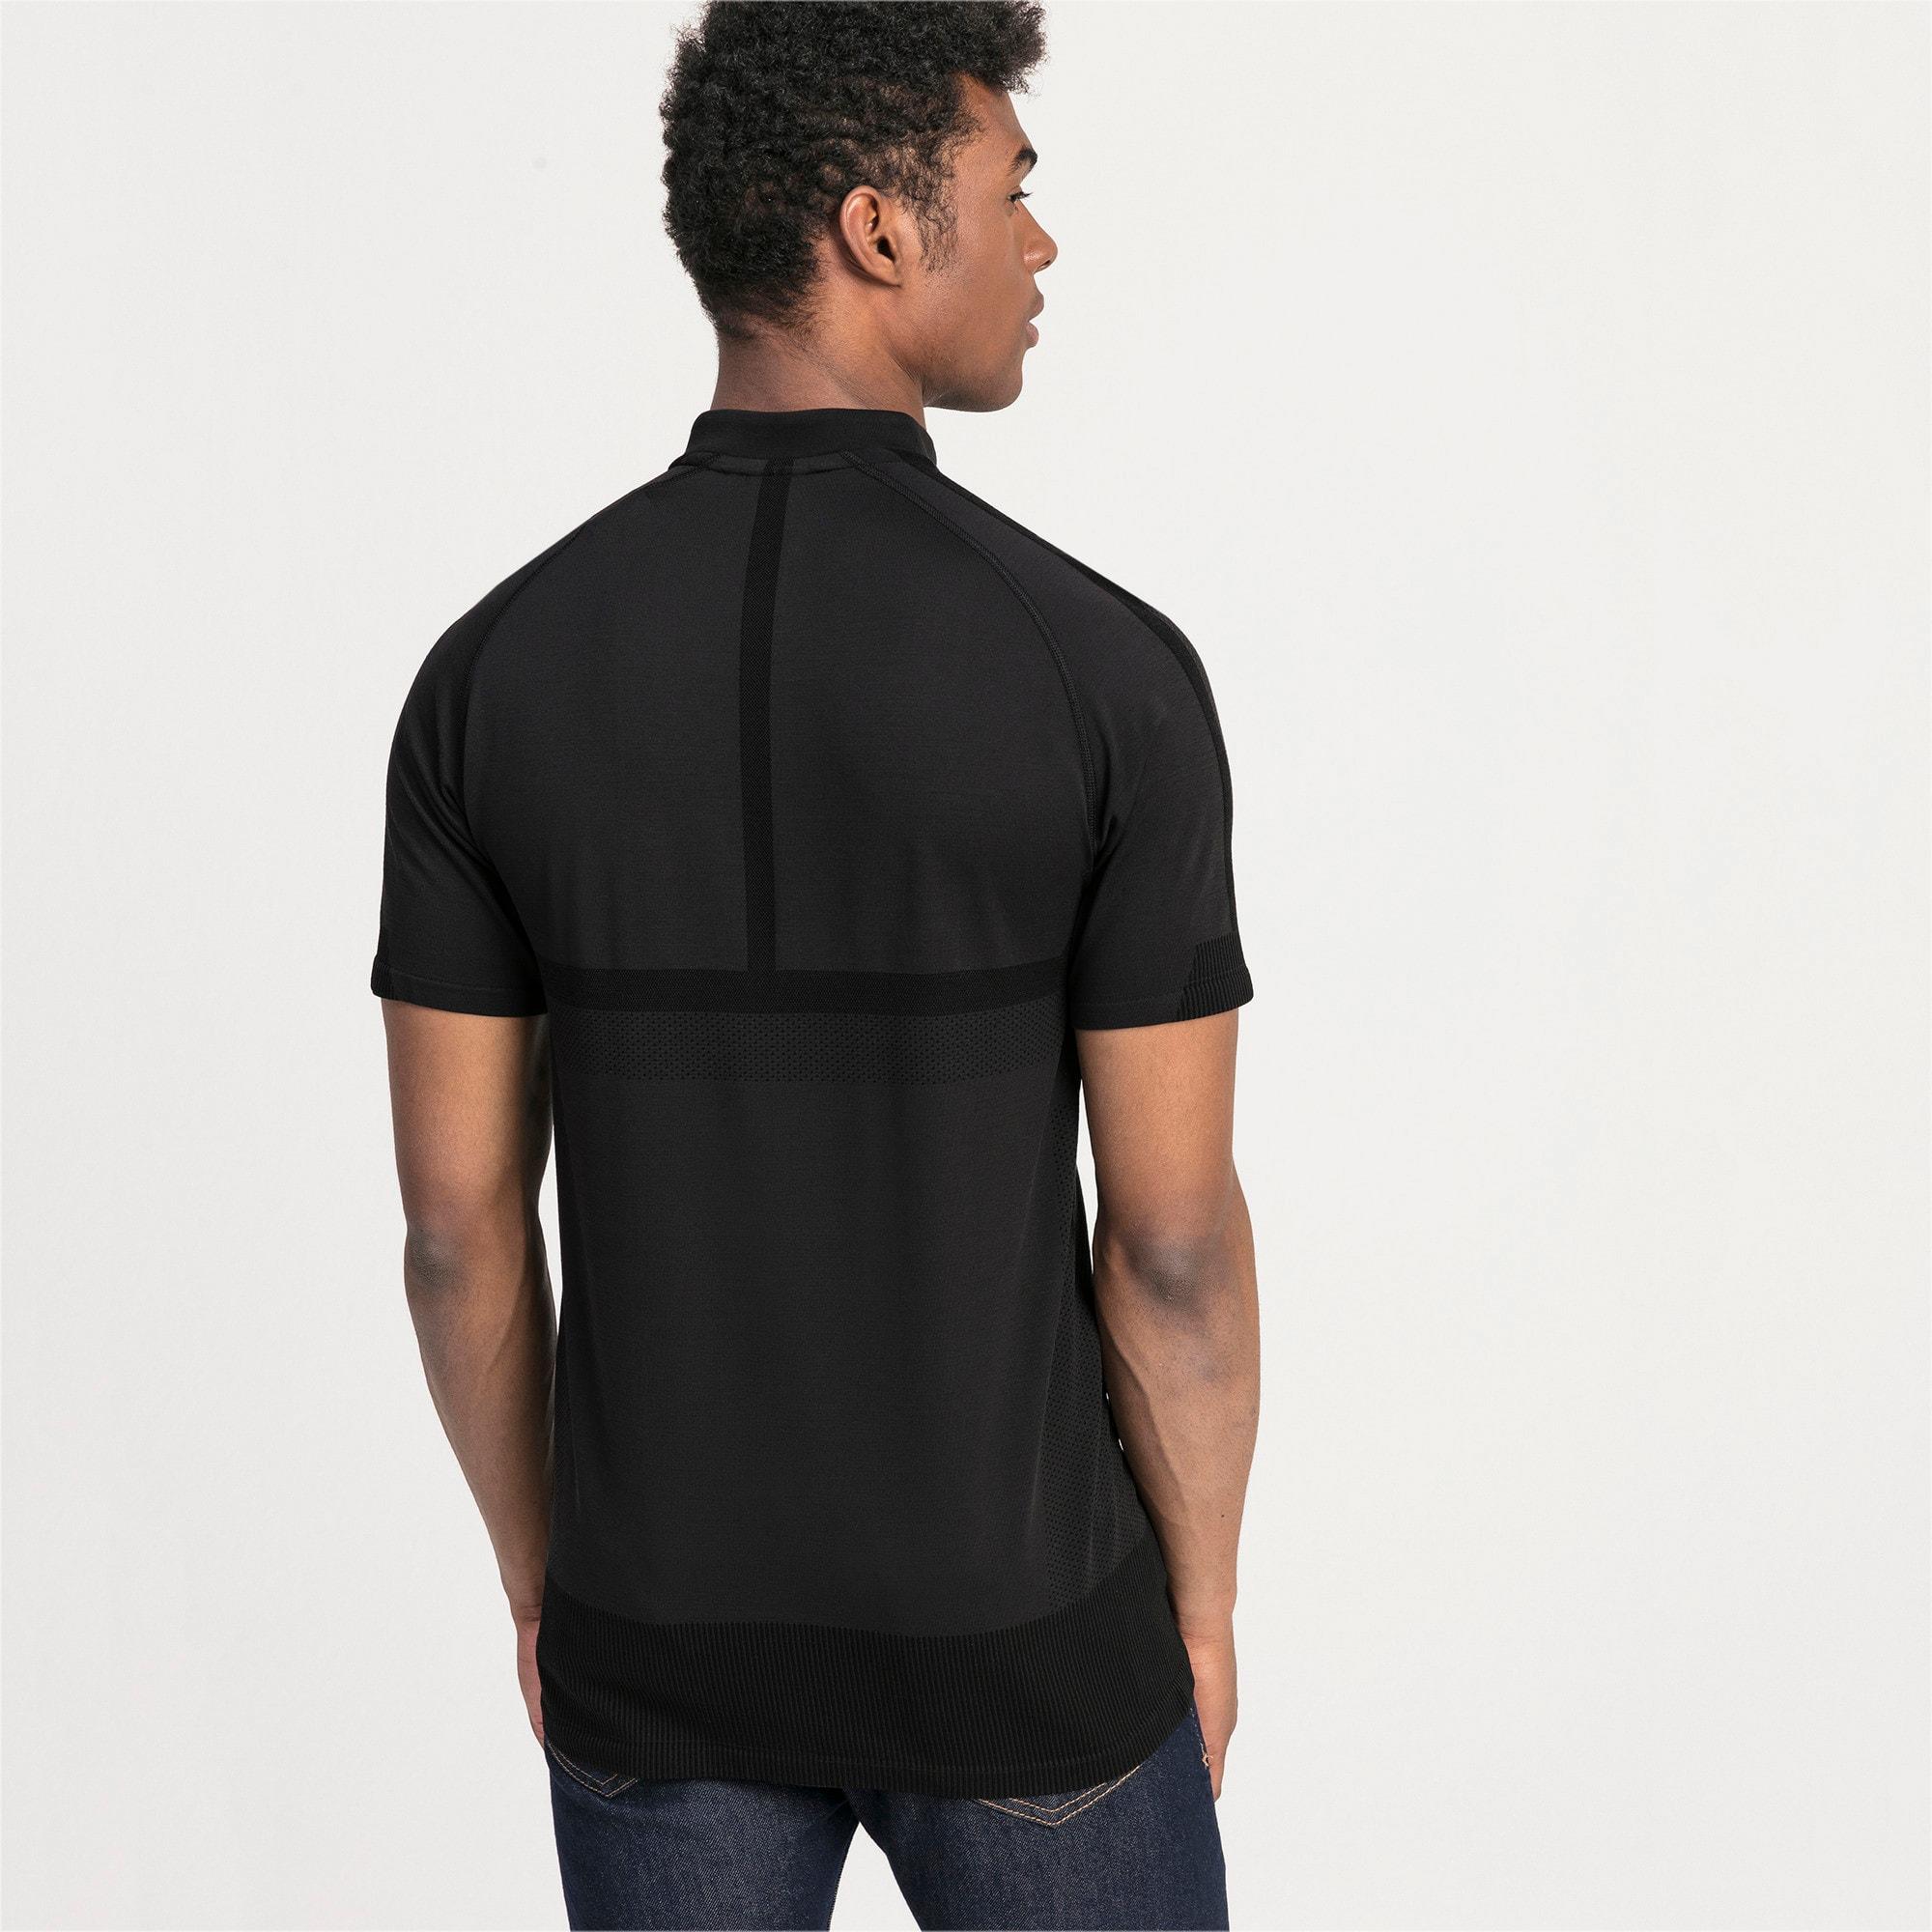 Thumbnail 2 of Mercedes AMG Petronas Men's Polo Shirt, Puma Black, medium